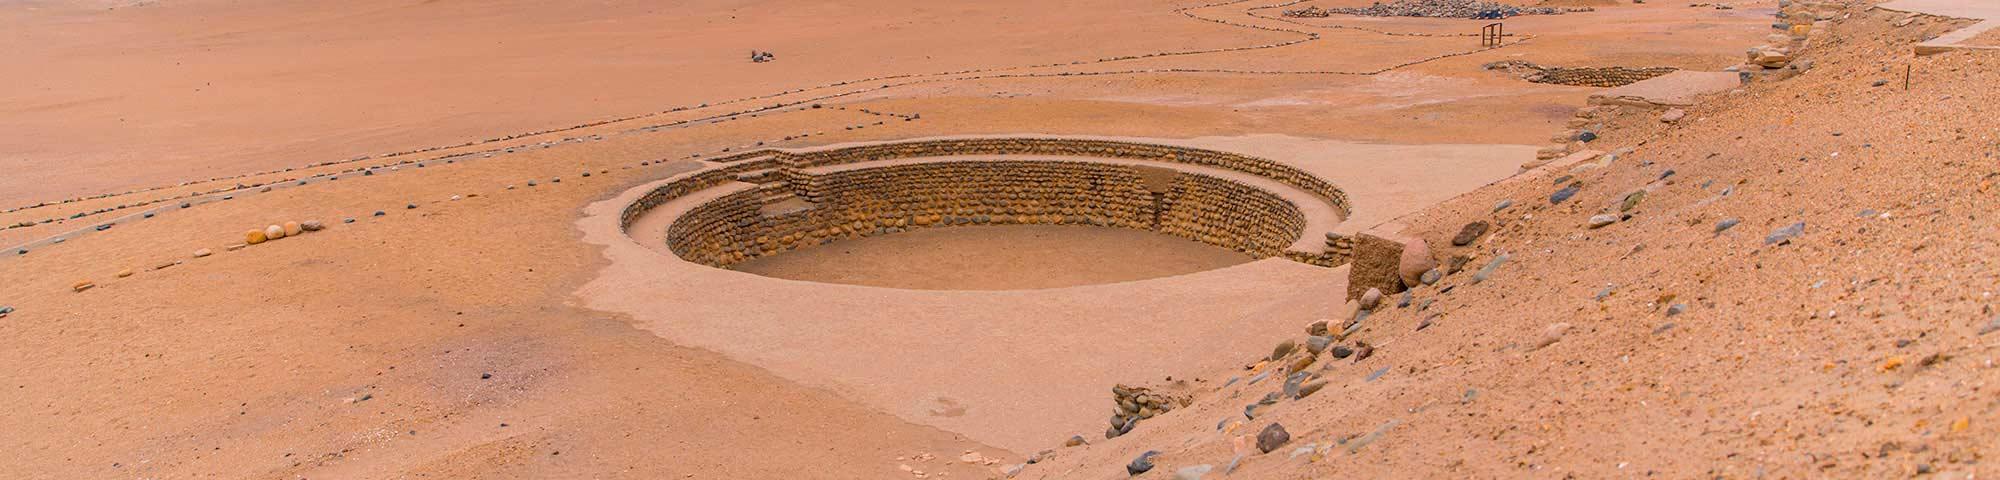 Zona Arqueológica Monumental Bandurria